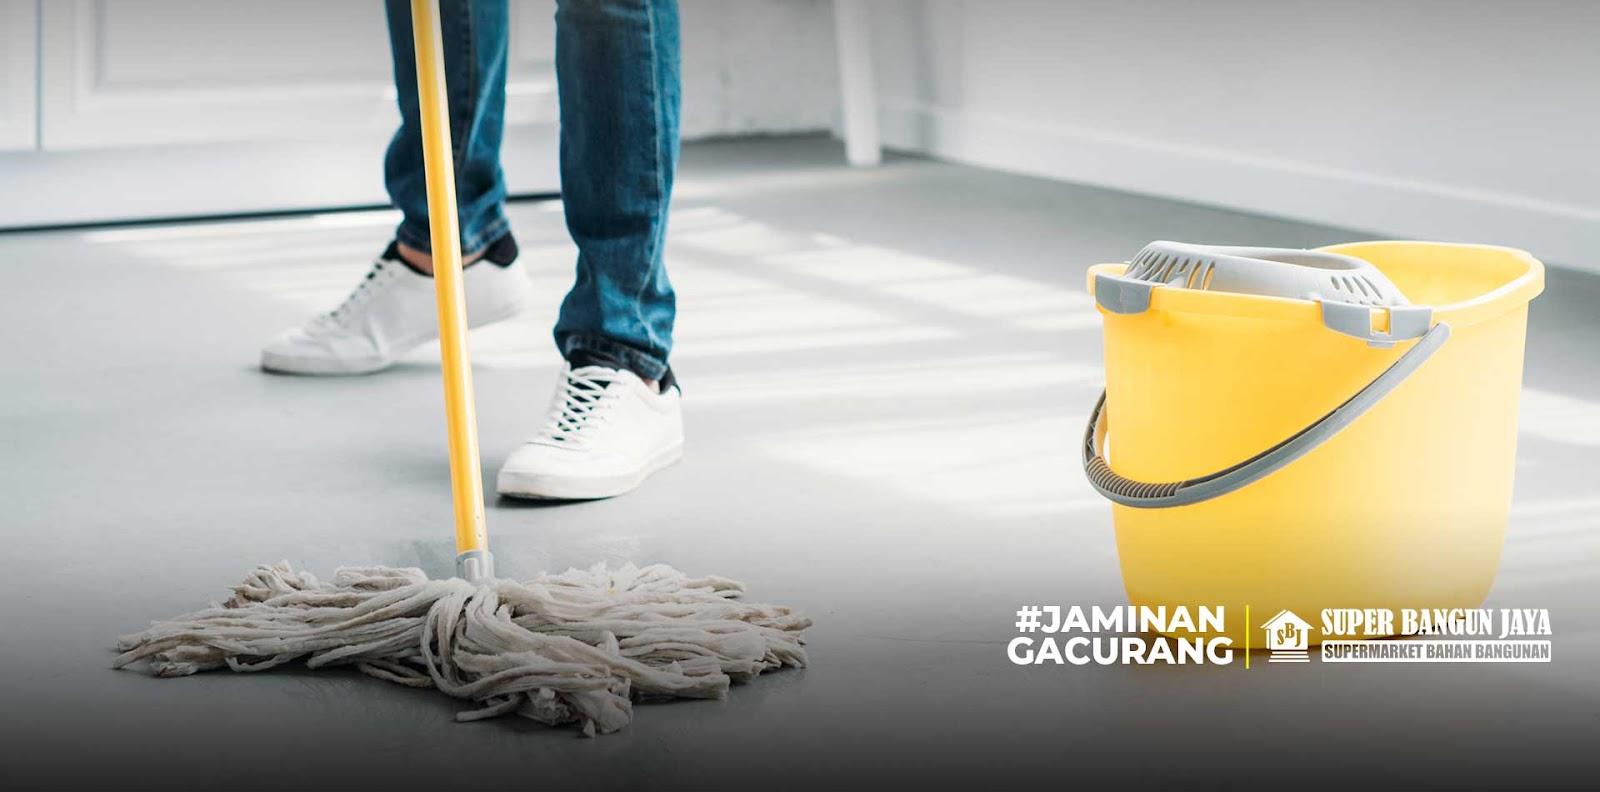 Cara merawat lantai keramik yang mulia